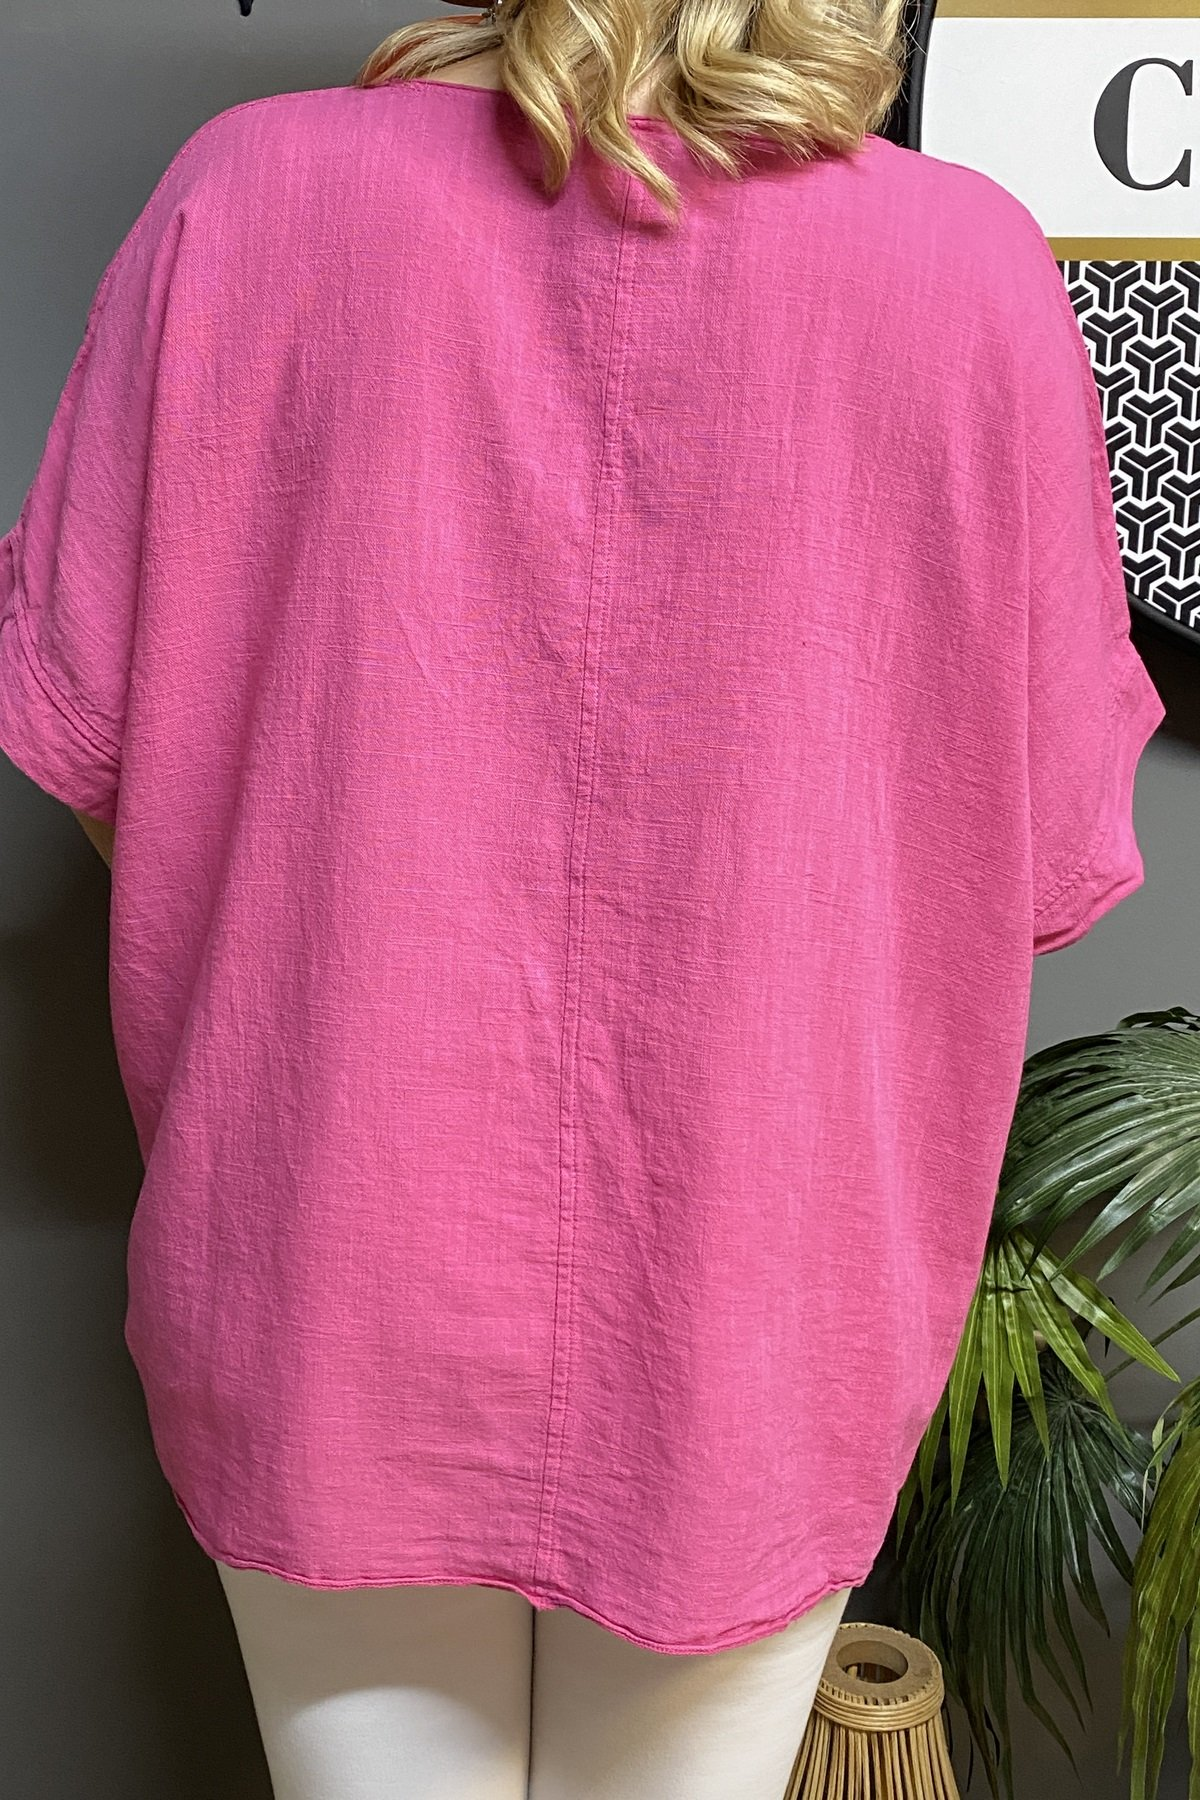 Tüy Detaylı Bluz